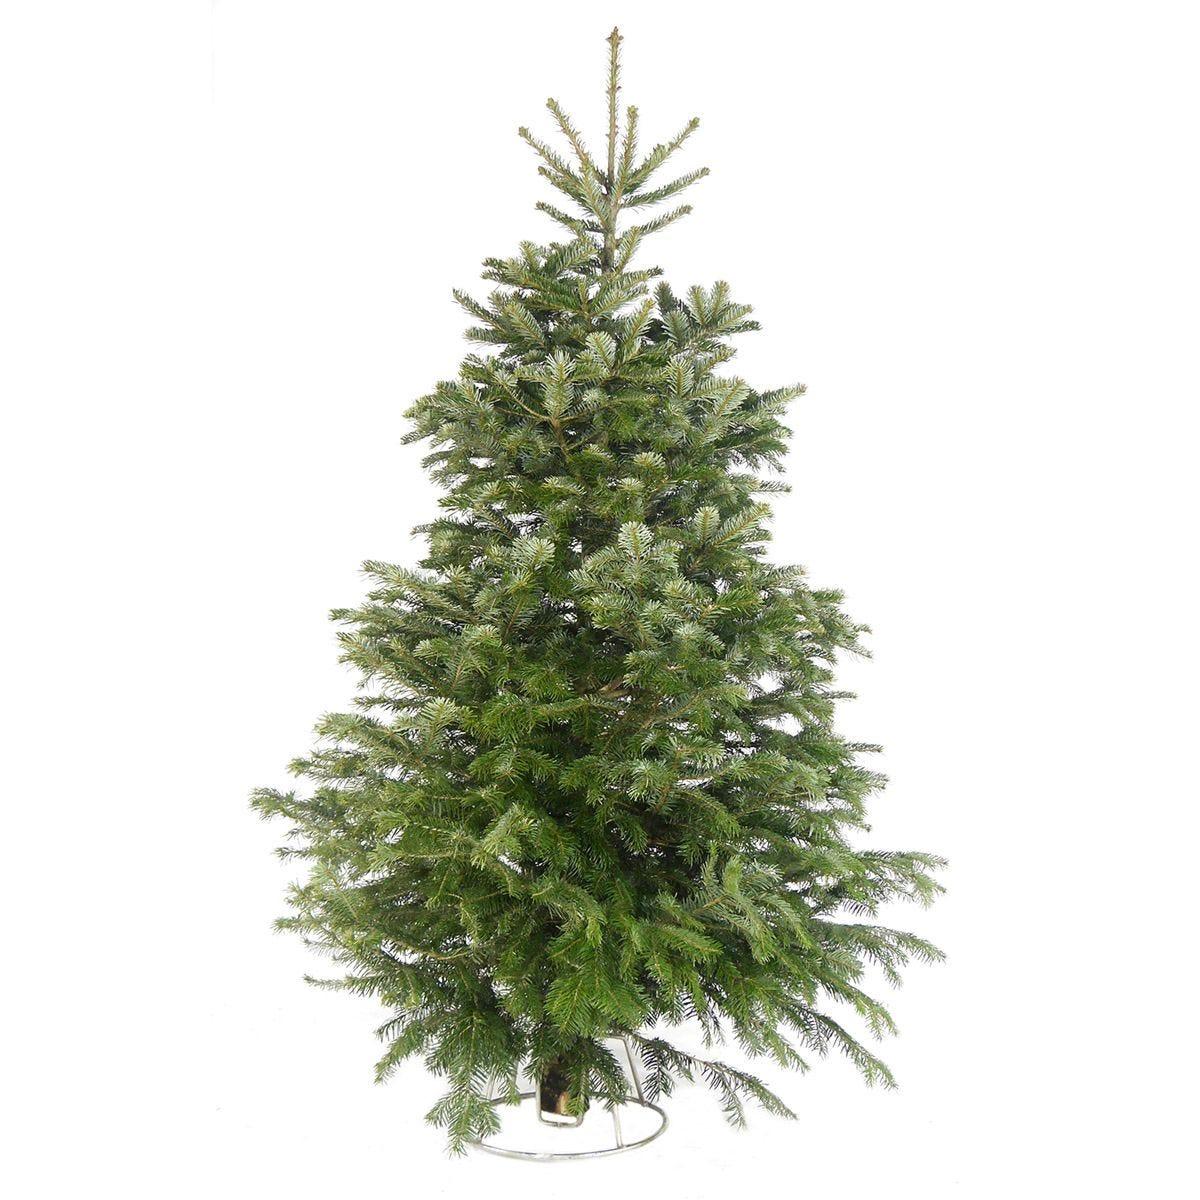 6ft Needlefresh Nordman Fir Real Christmas Tree (180-210cm)